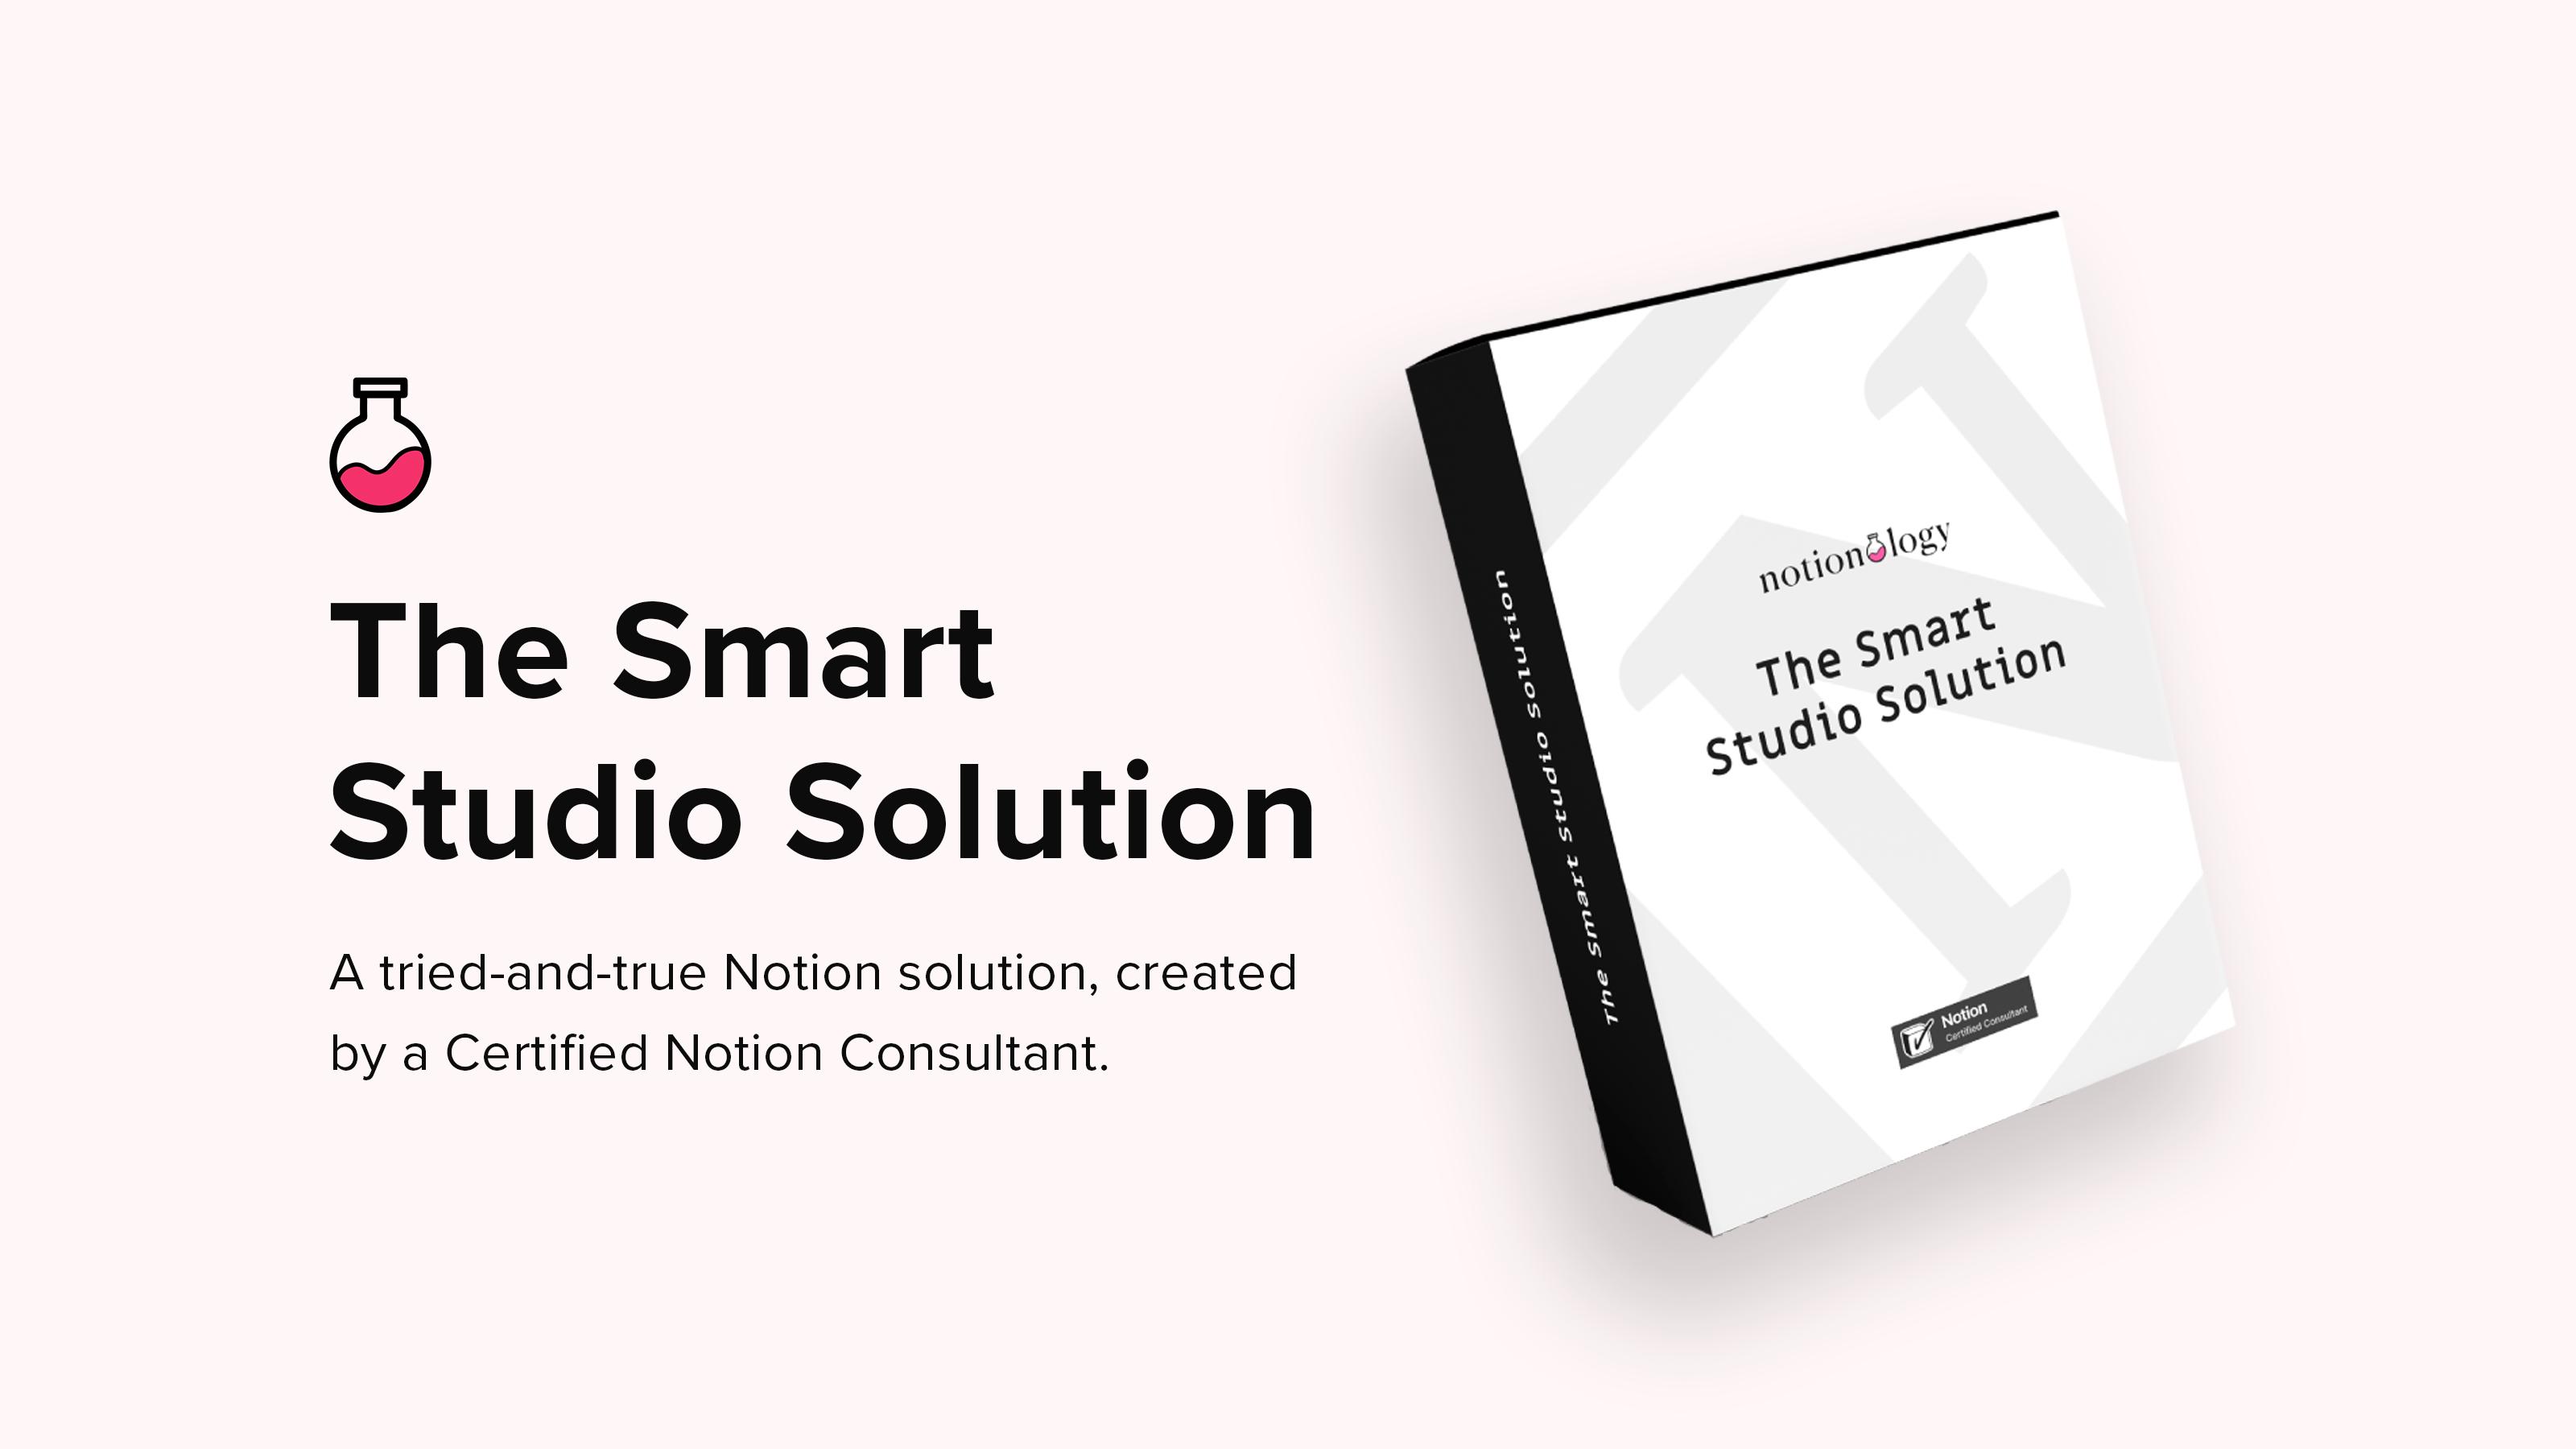 The Smart Studio Solution